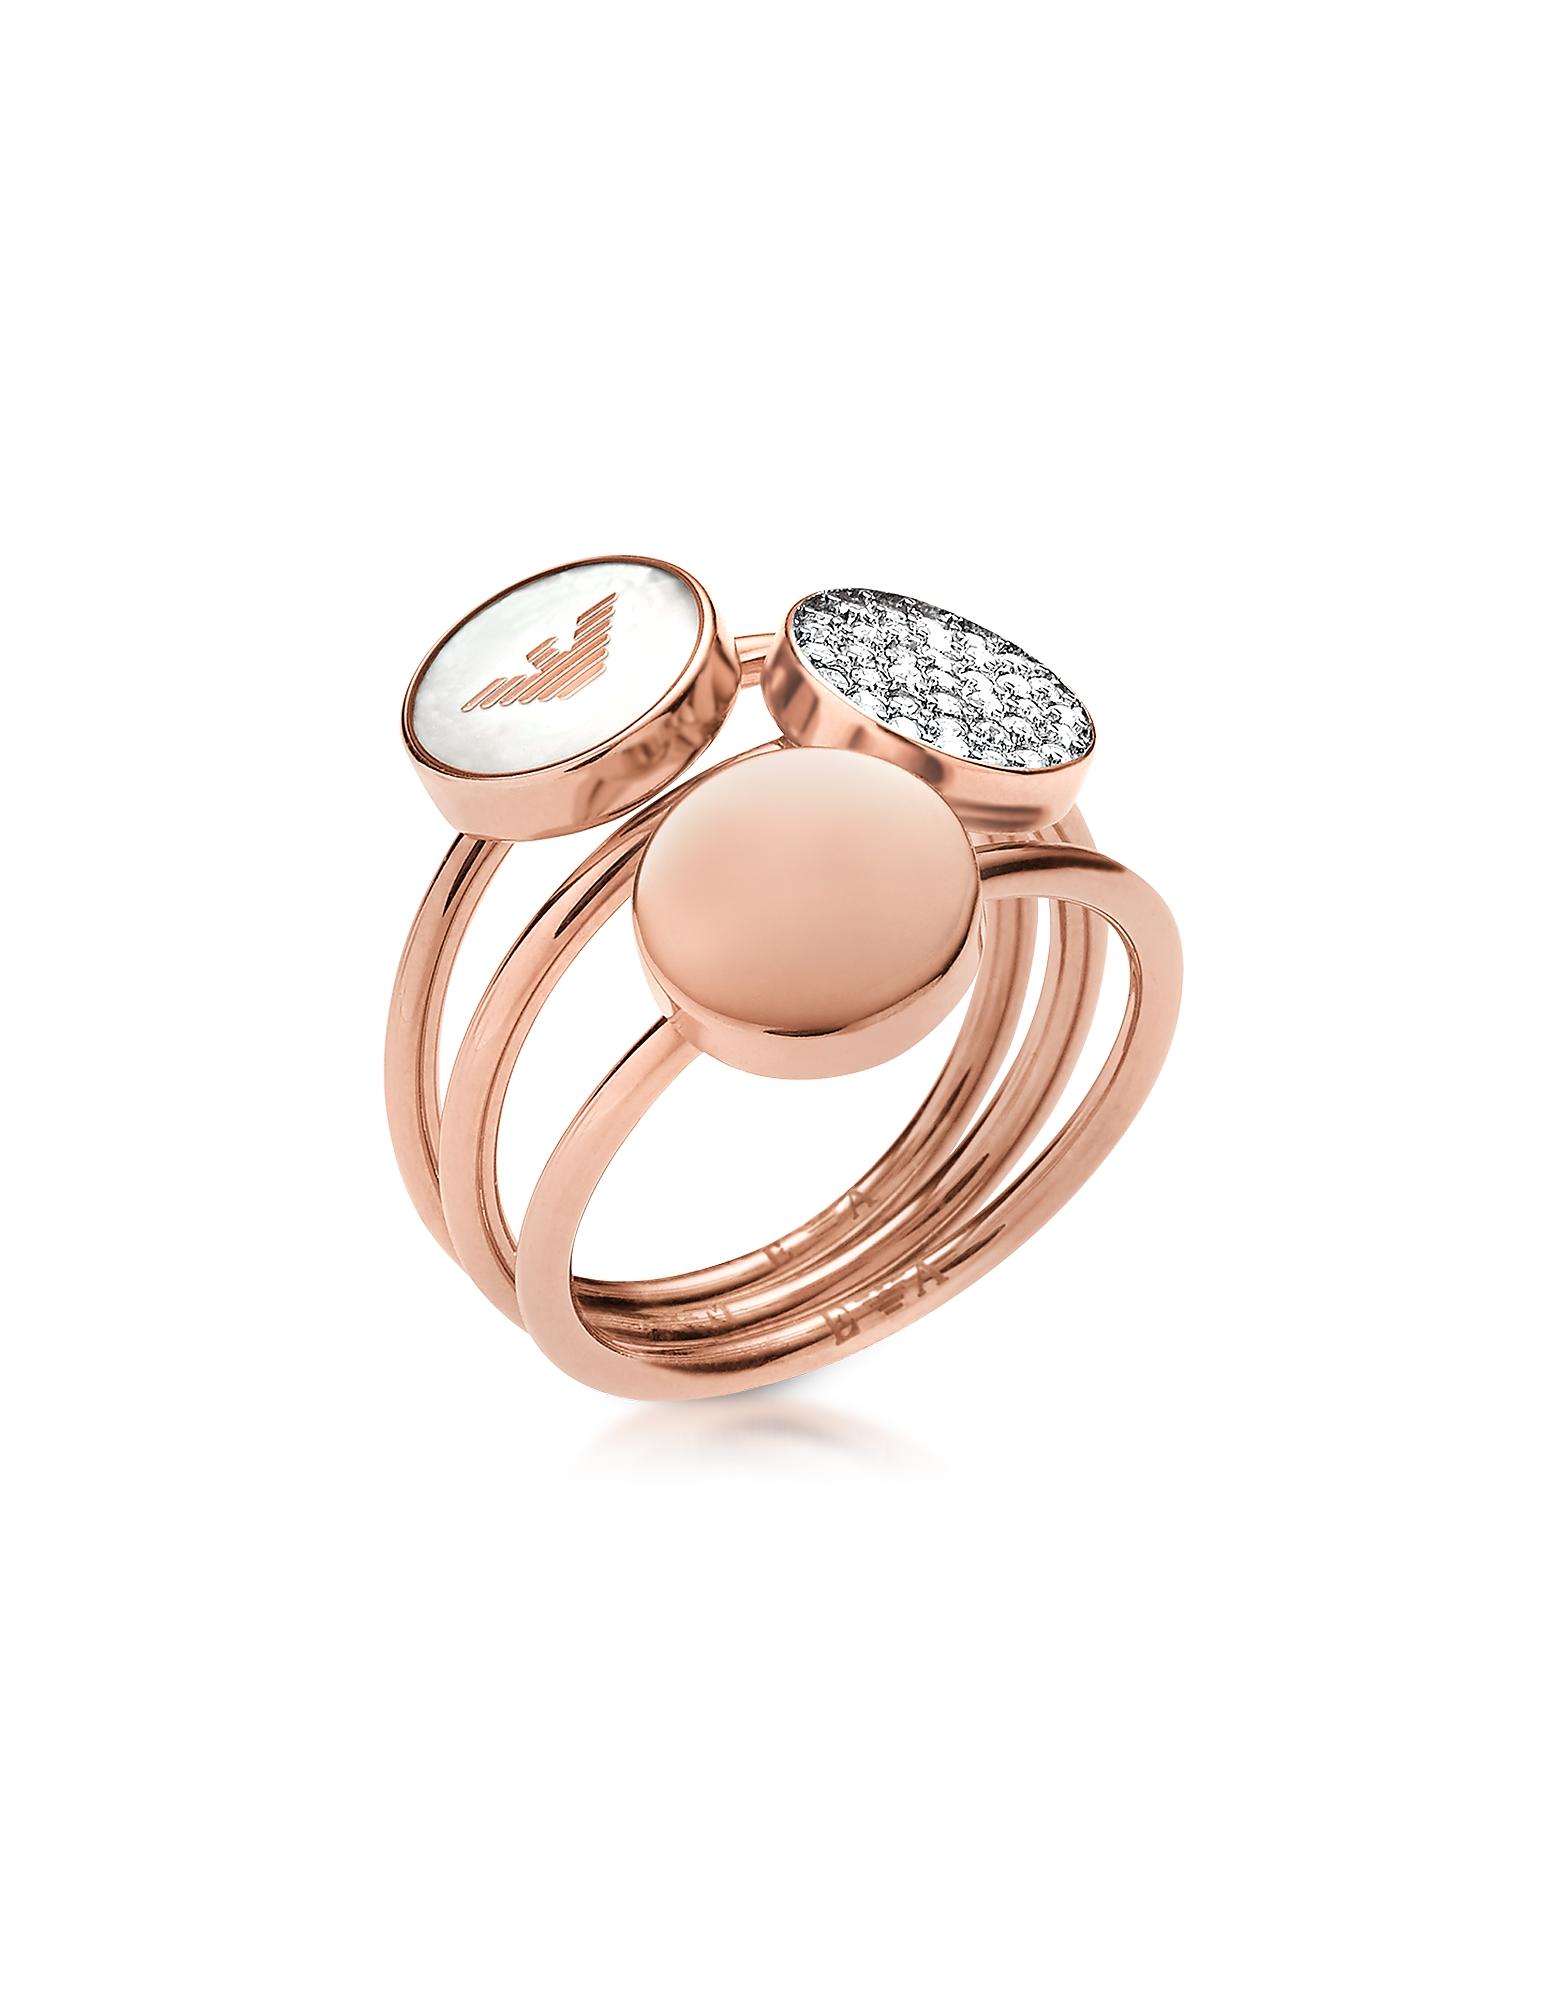 Emporio Armani Rings, Signature Rose Goldtone Triple Ring